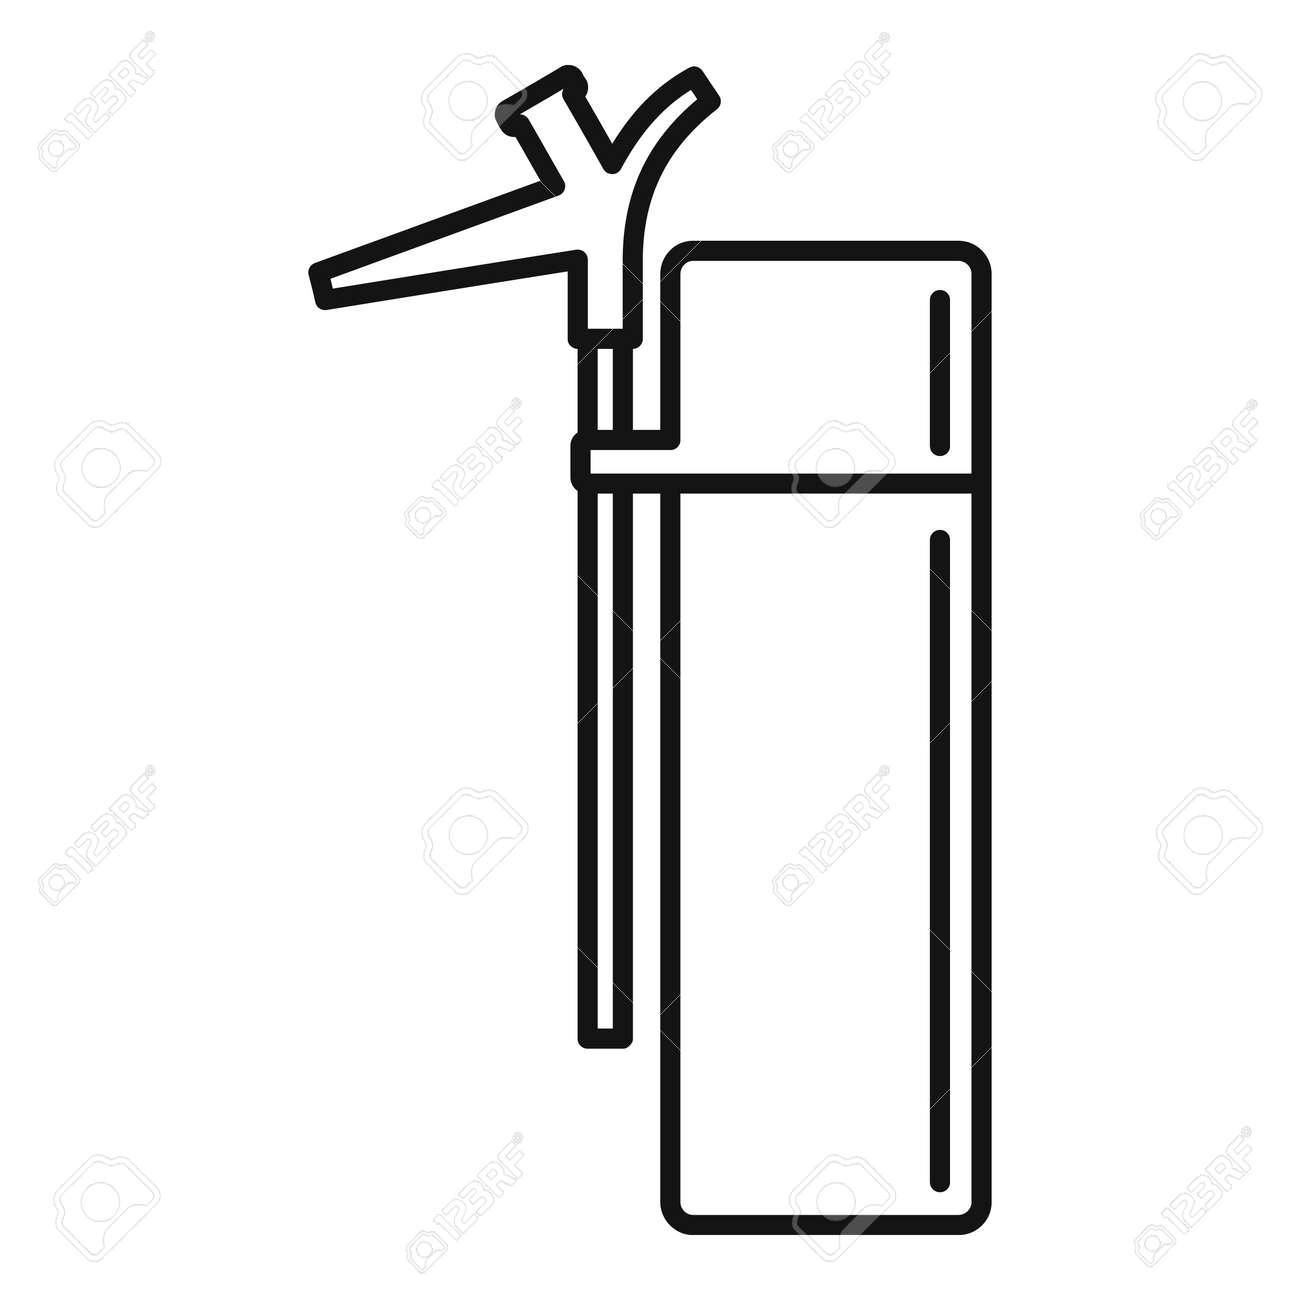 Carpenter polyurethane foam icon, outline style - 156562819